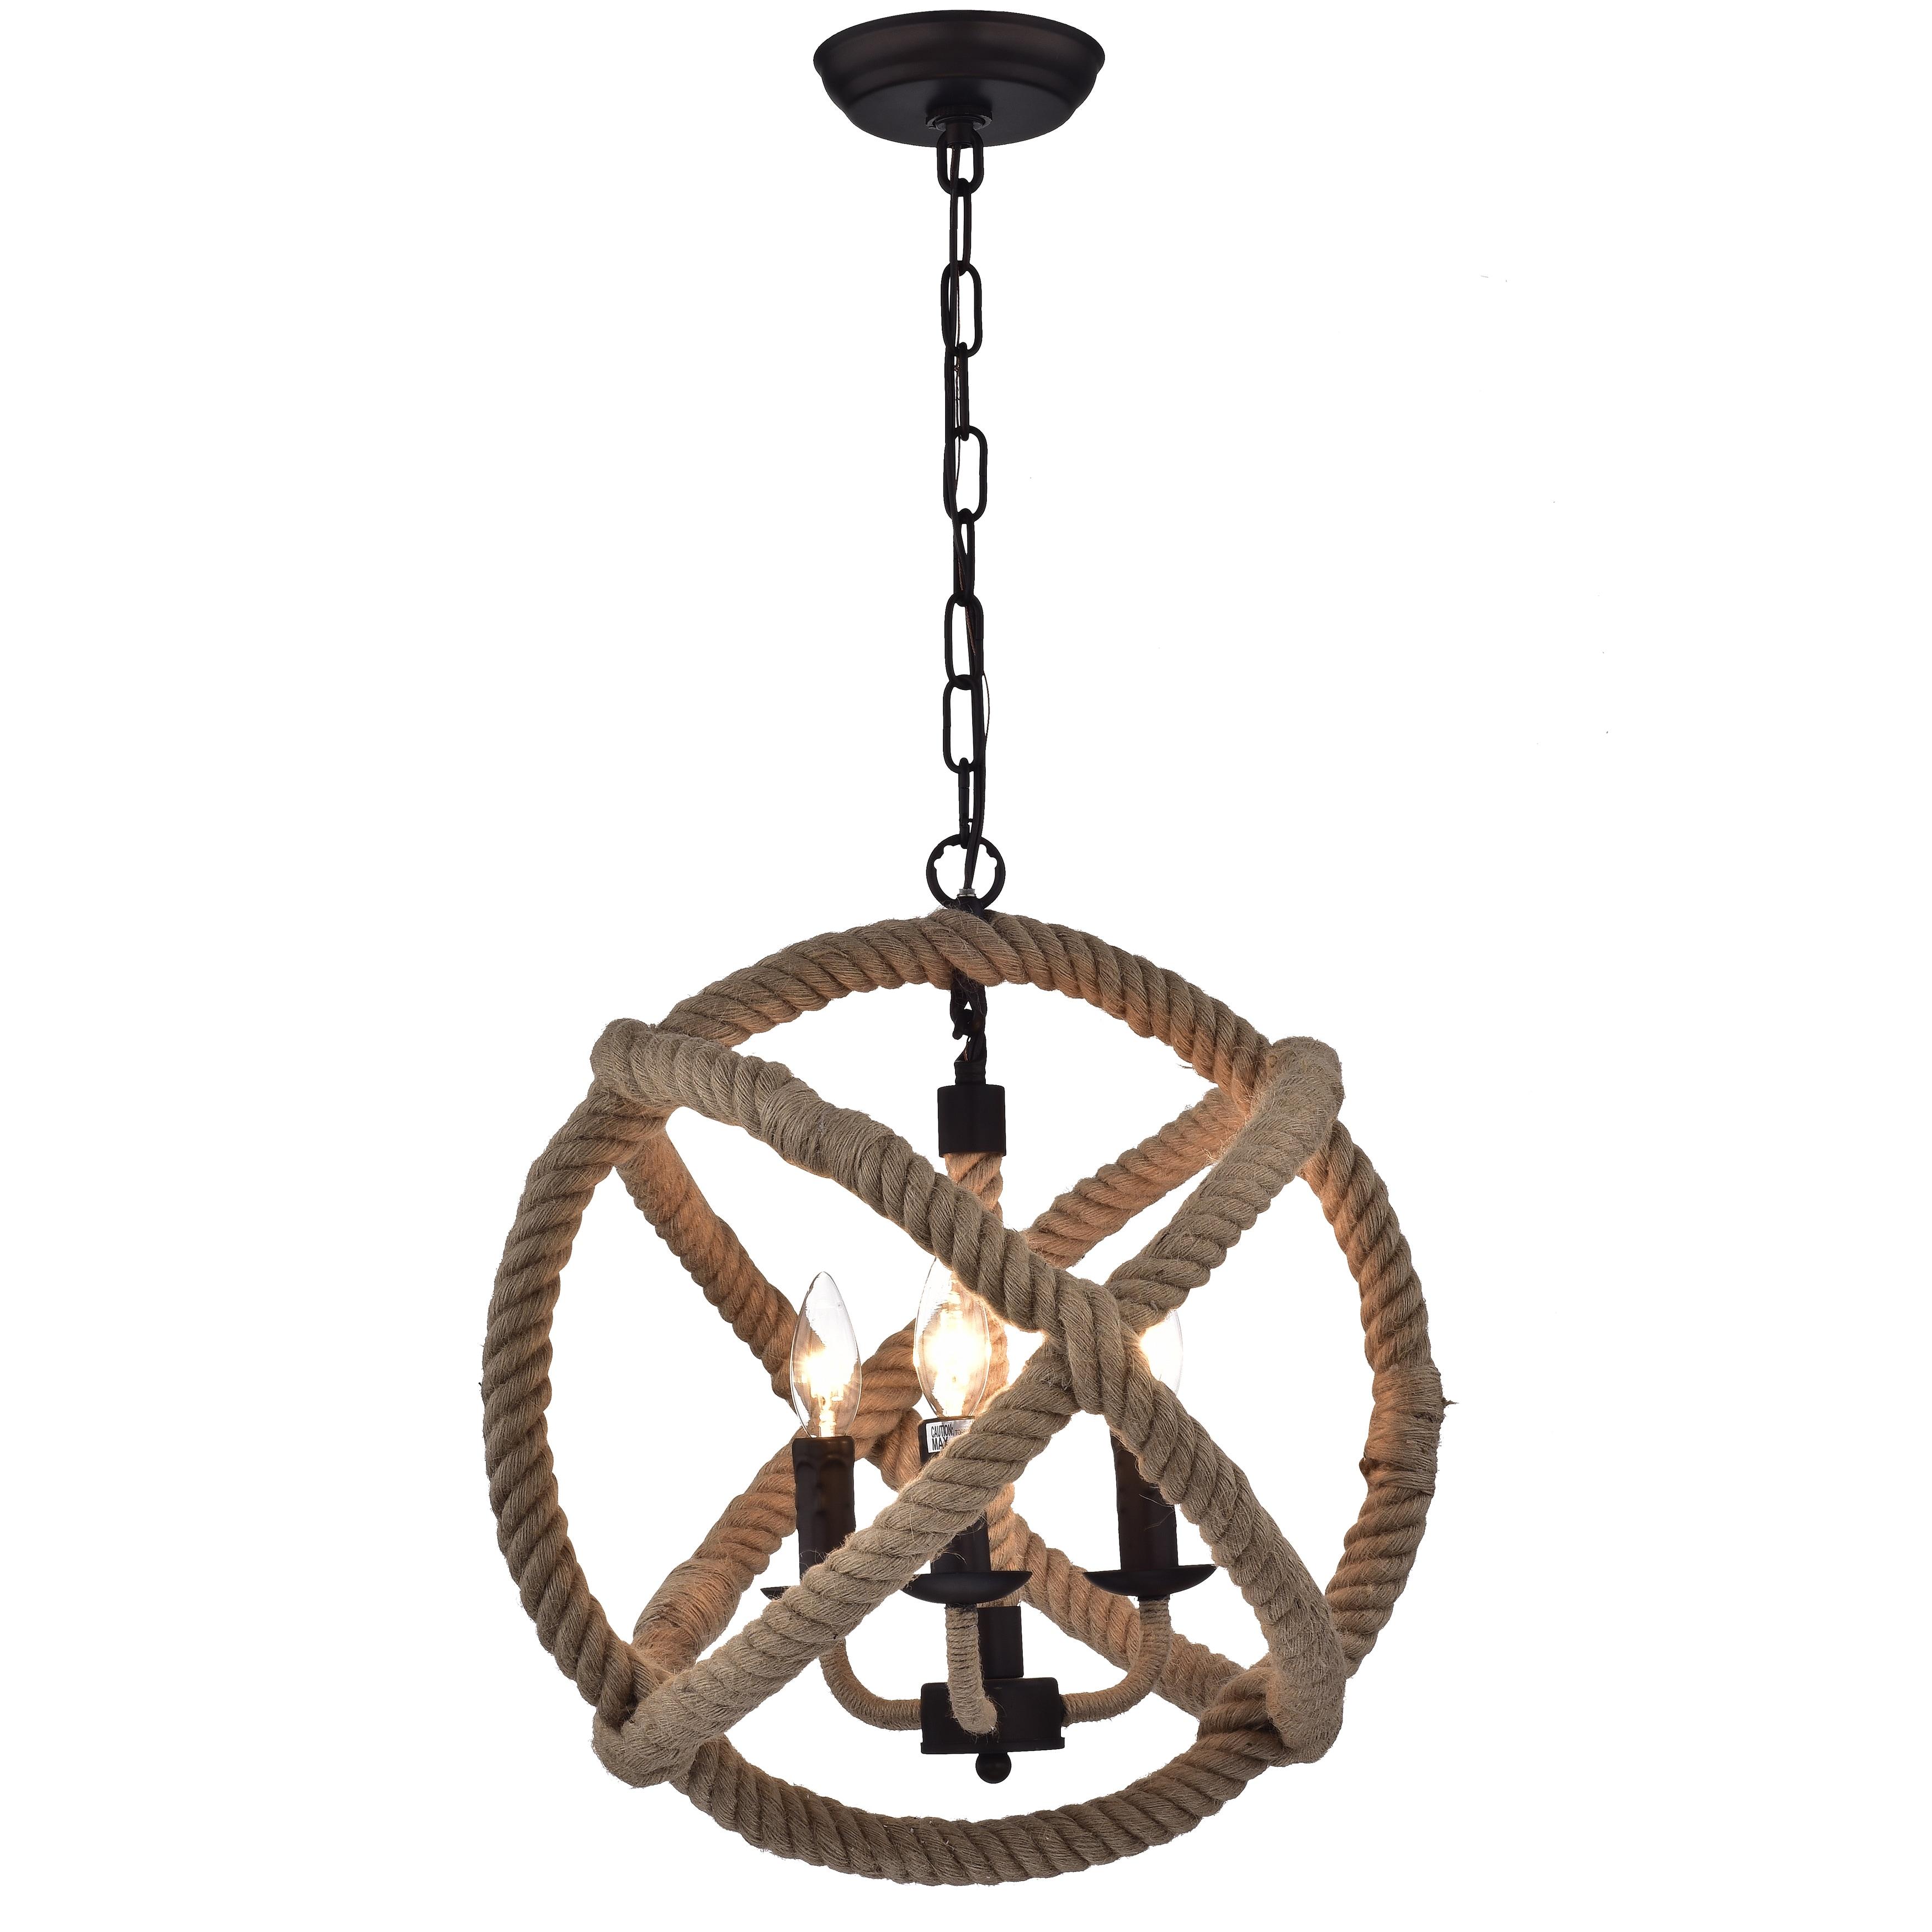 Twirlie 165 inch hemp rope antique bronze metal chandelier free twirlie 165 inch hemp rope antique bronze metal chandelier free shipping today overstock 19967483 arubaitofo Image collections